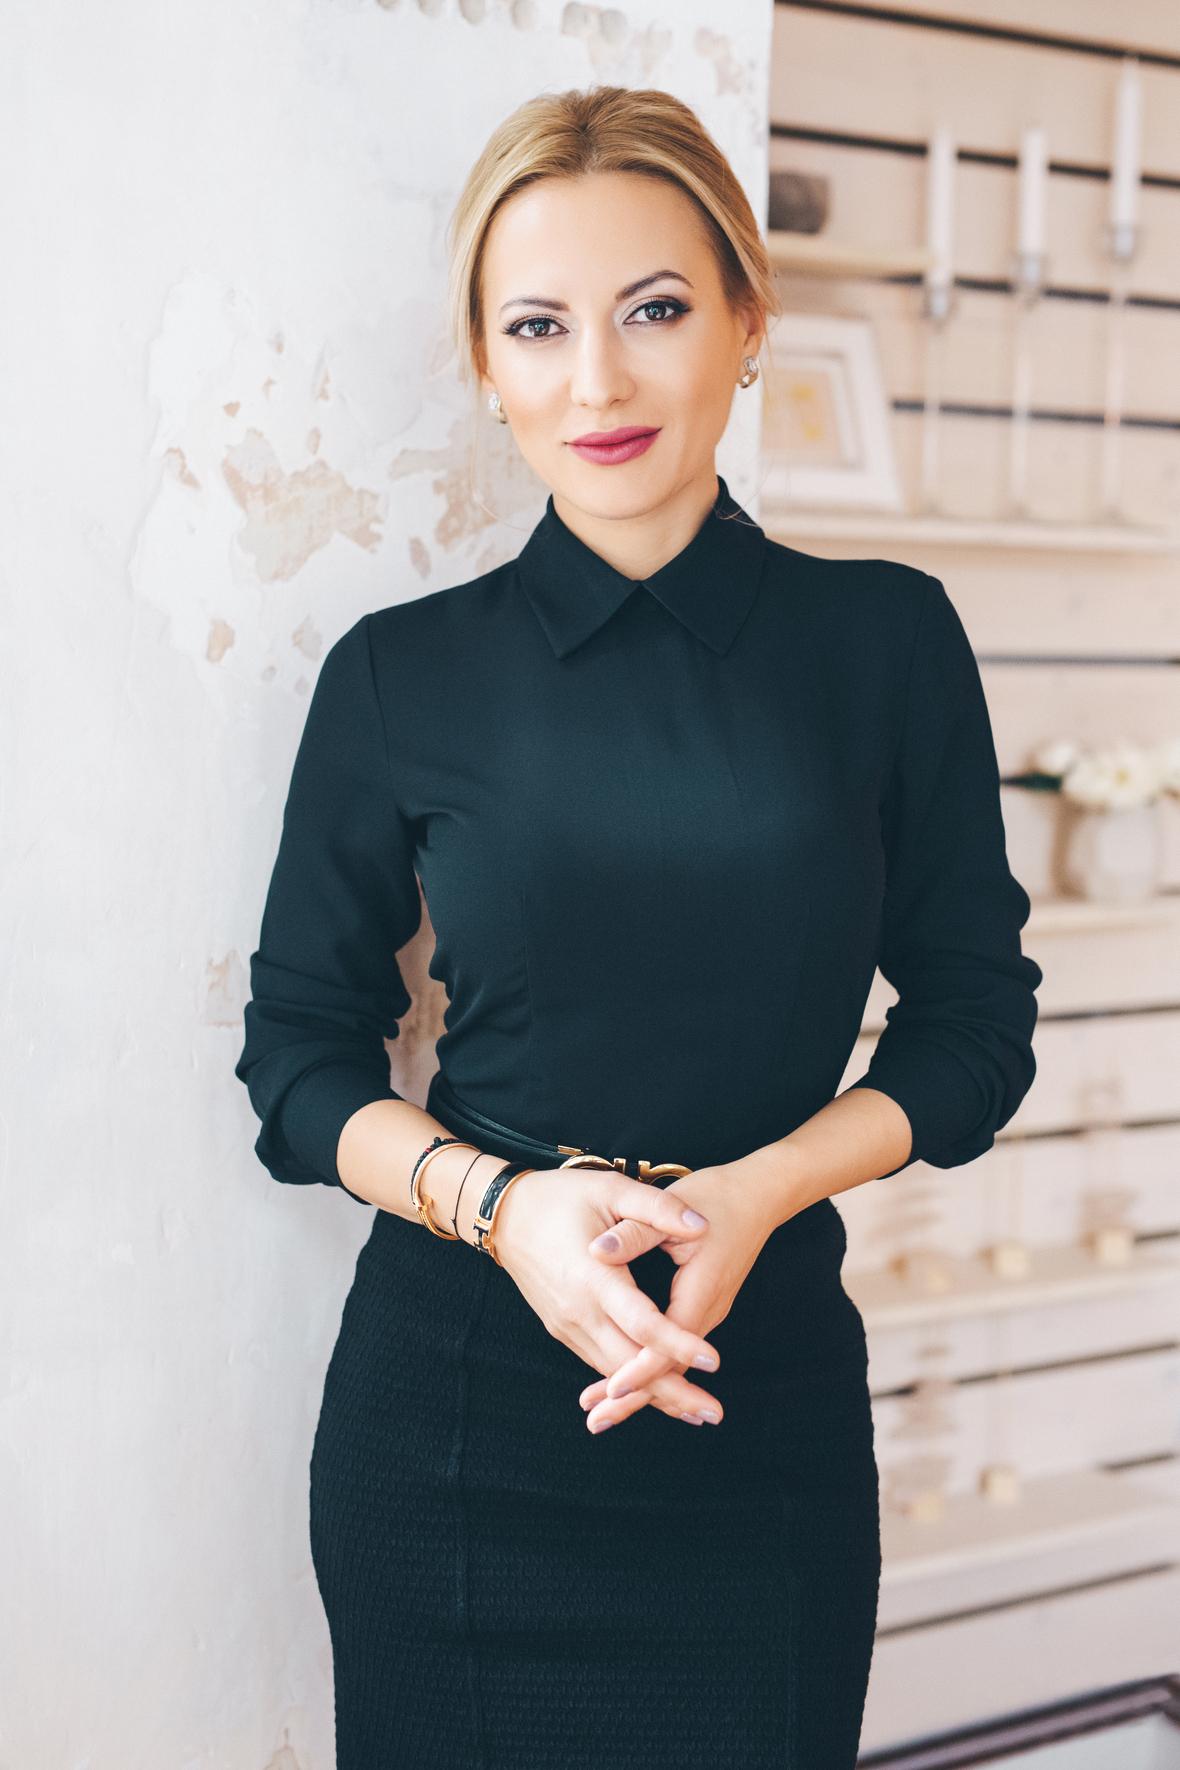 Dr. Silvia Stanculescu Vasalos